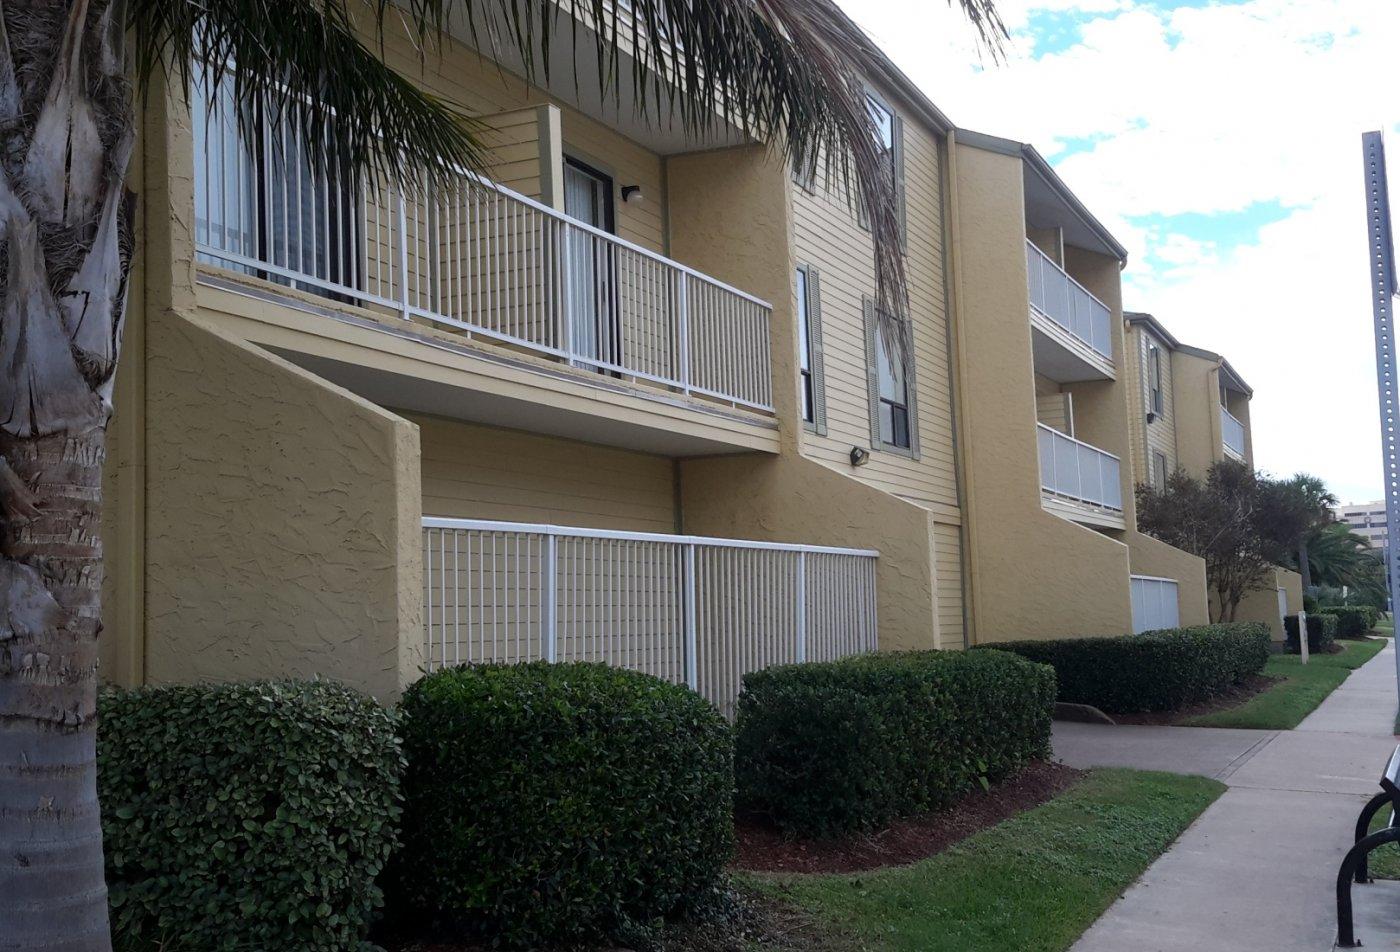 Outside view of Carelton Courtyard apartments in Galveston Texas